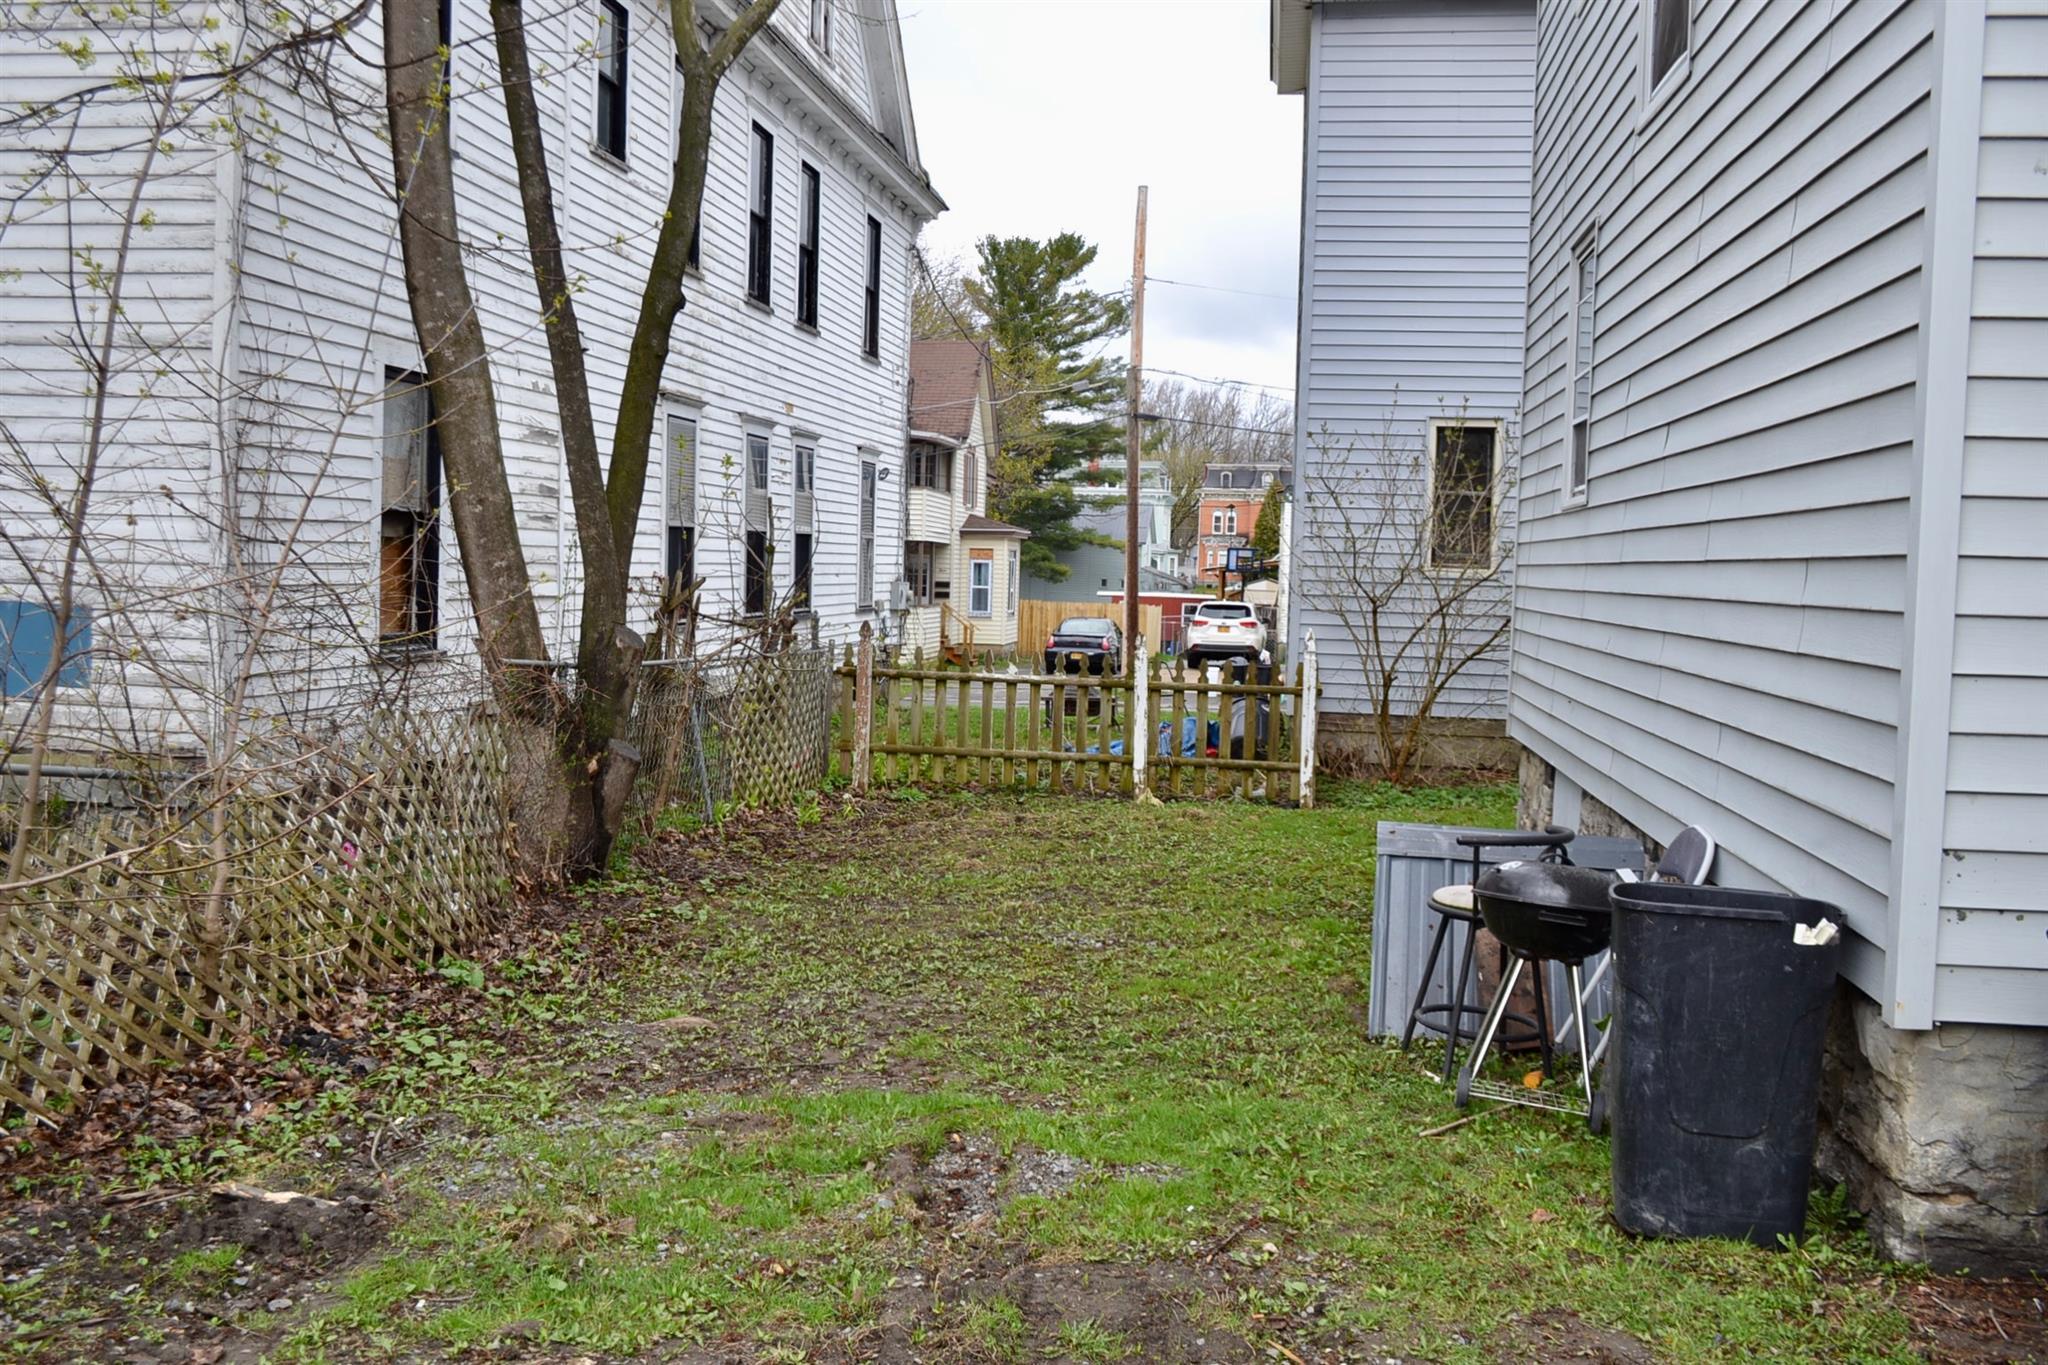 Johnstown image 45